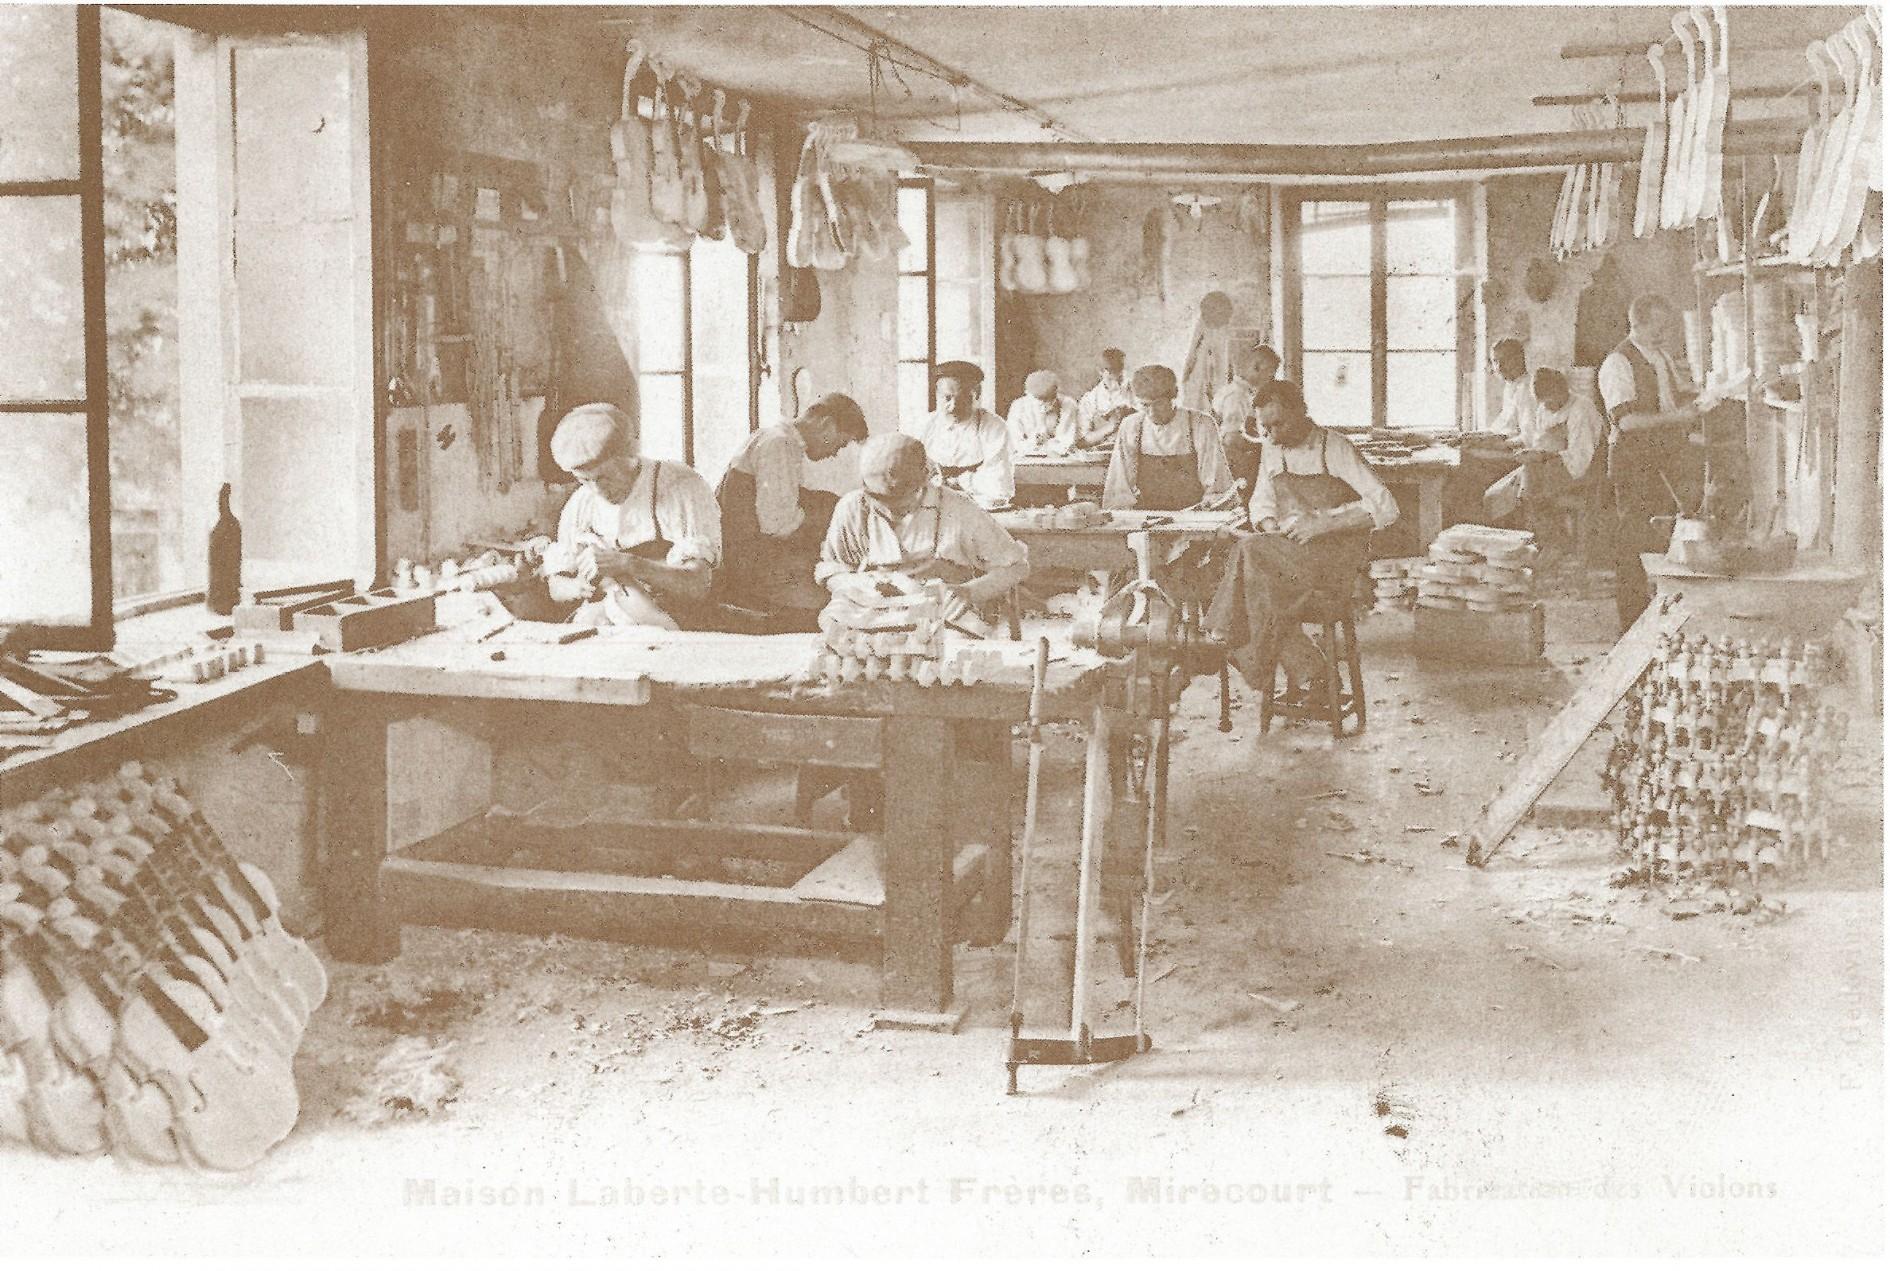 atelier-laberte-humbert